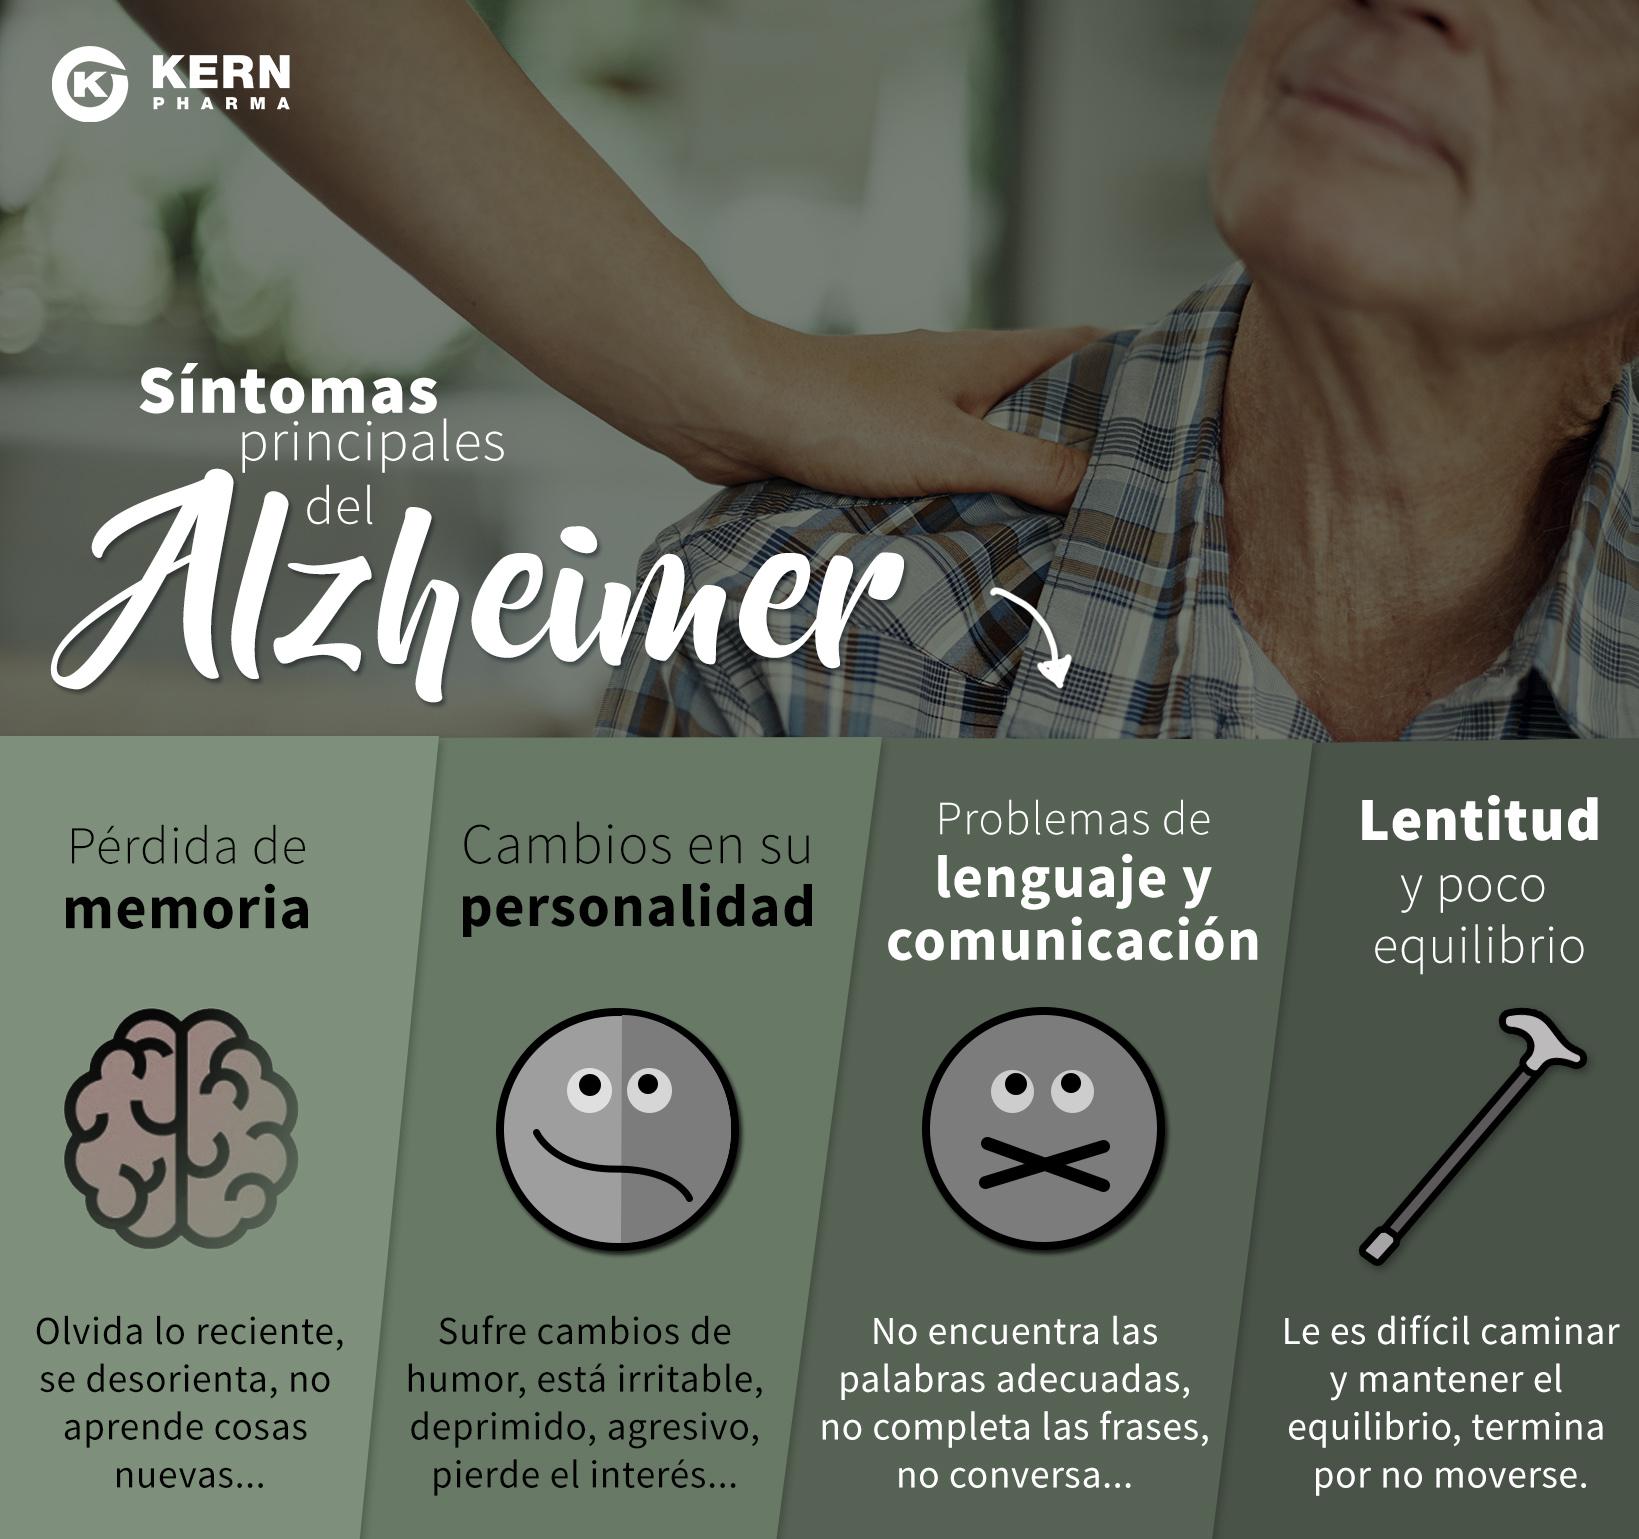 La Enfermedad De Alzheimer Kern Pharma